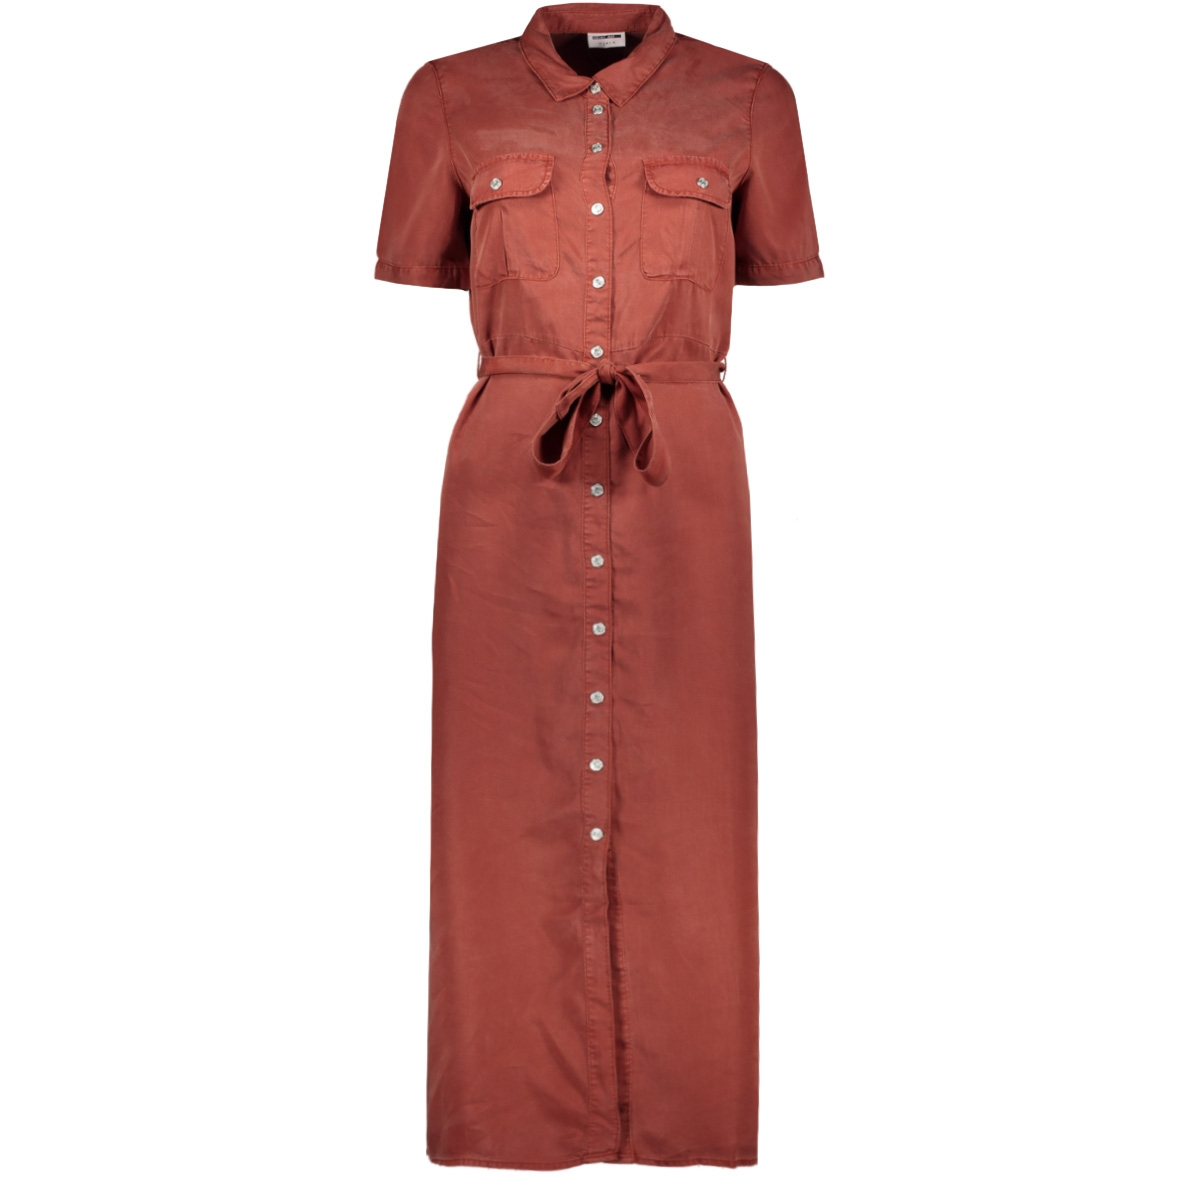 nmcersei s/s endi button dress bg 27011292 noisy may jurk burnt henna